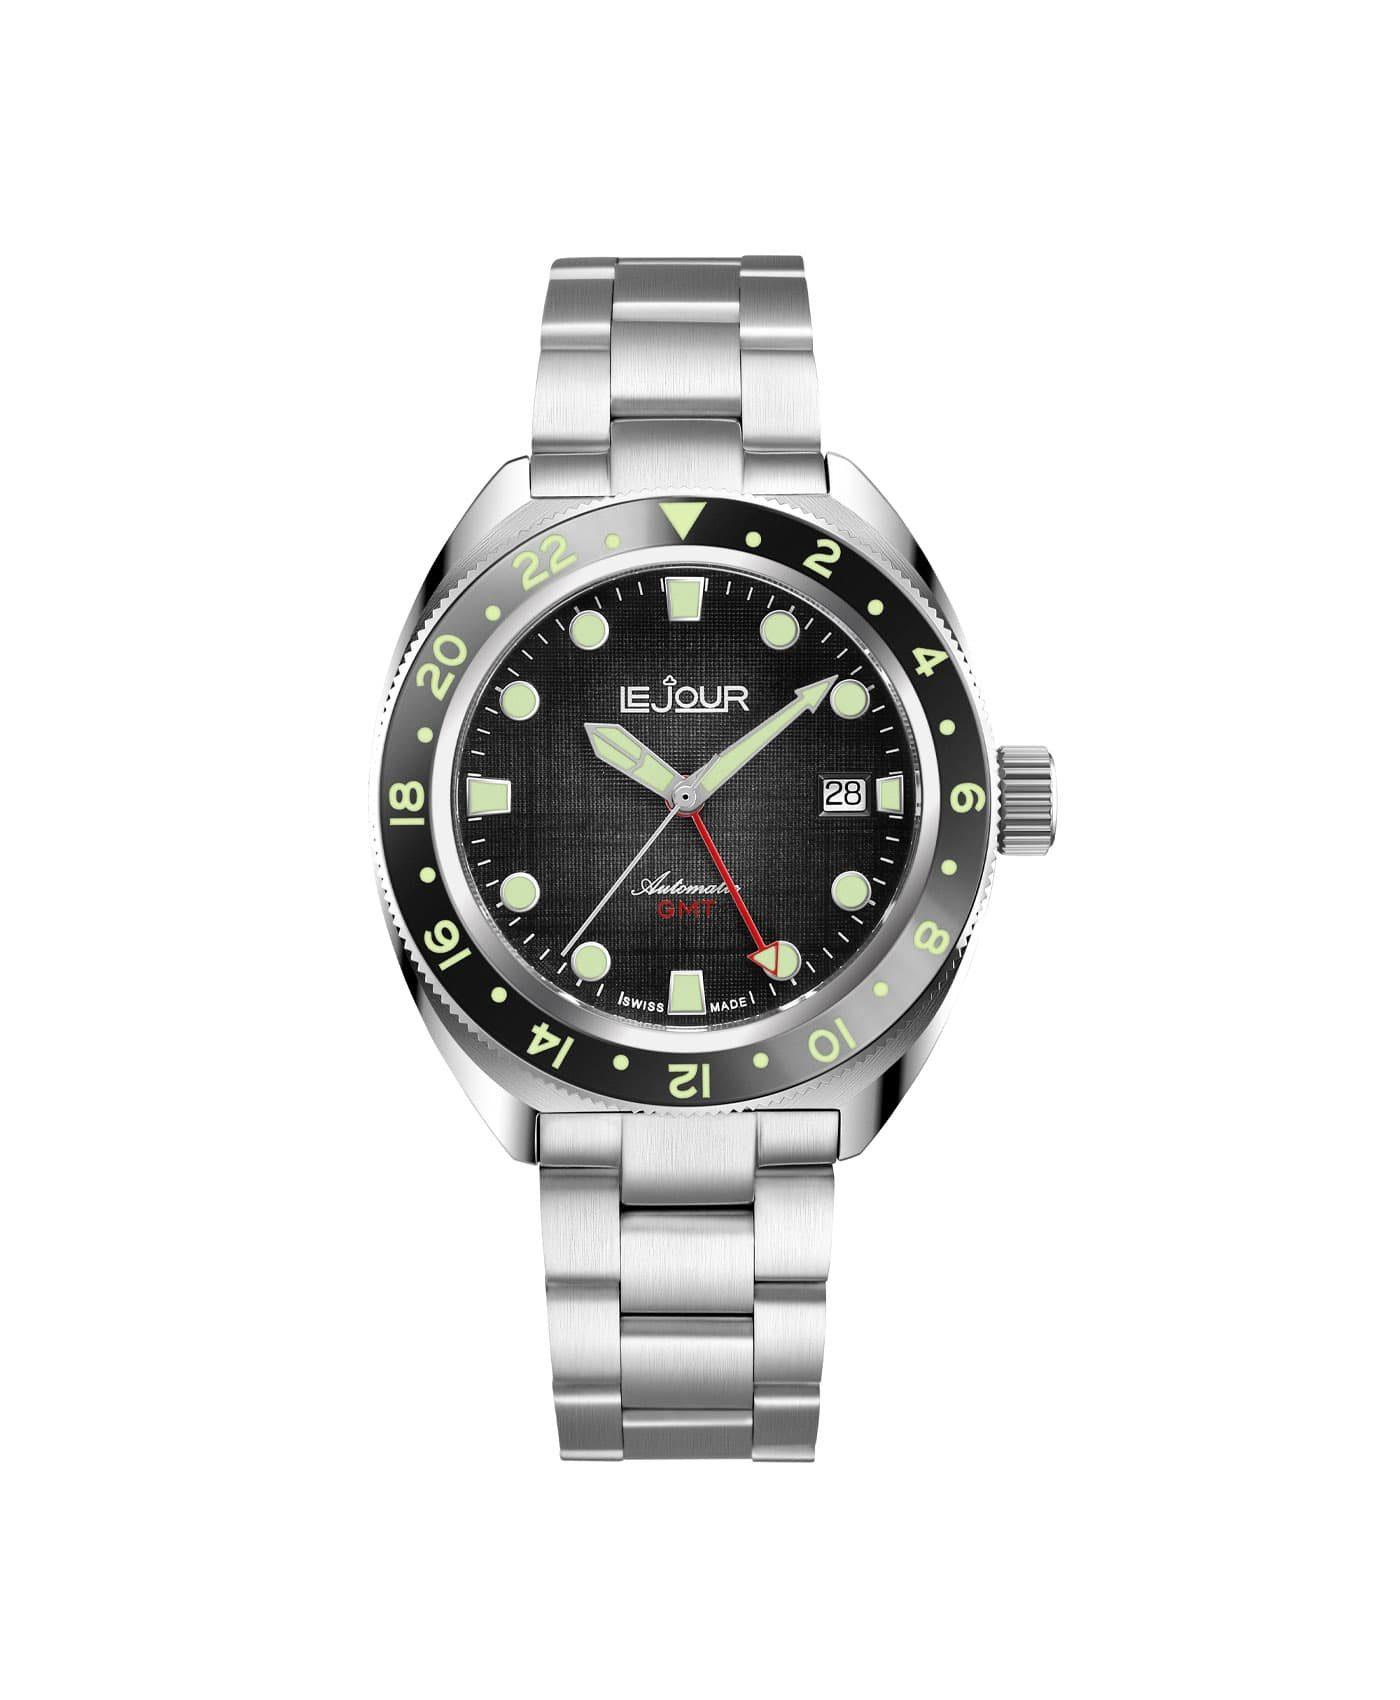 LJ-HH-GMT-001 textured black dial